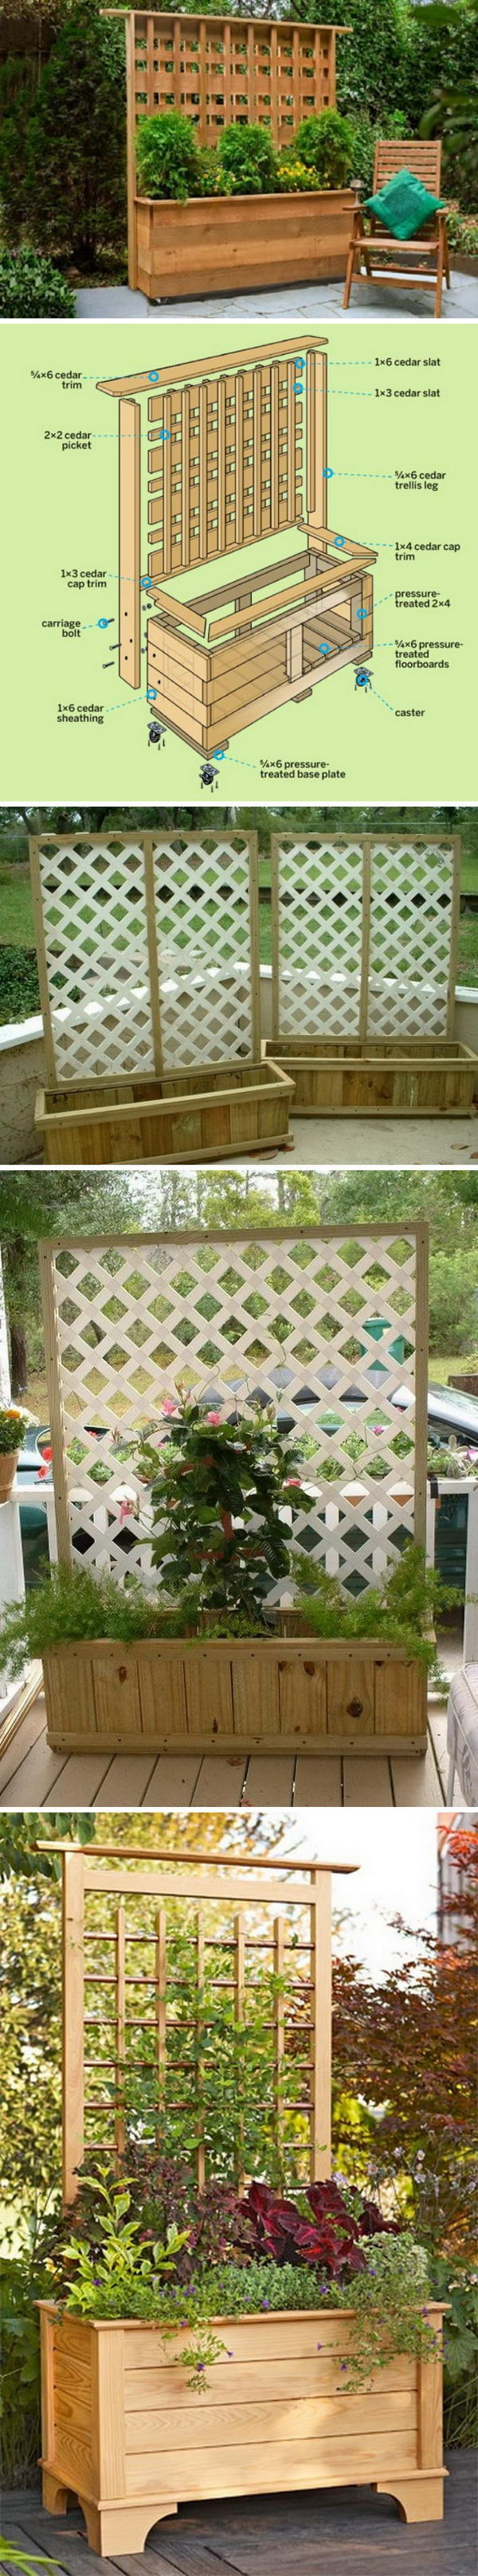 DIY Privacy Planter with Trellis.